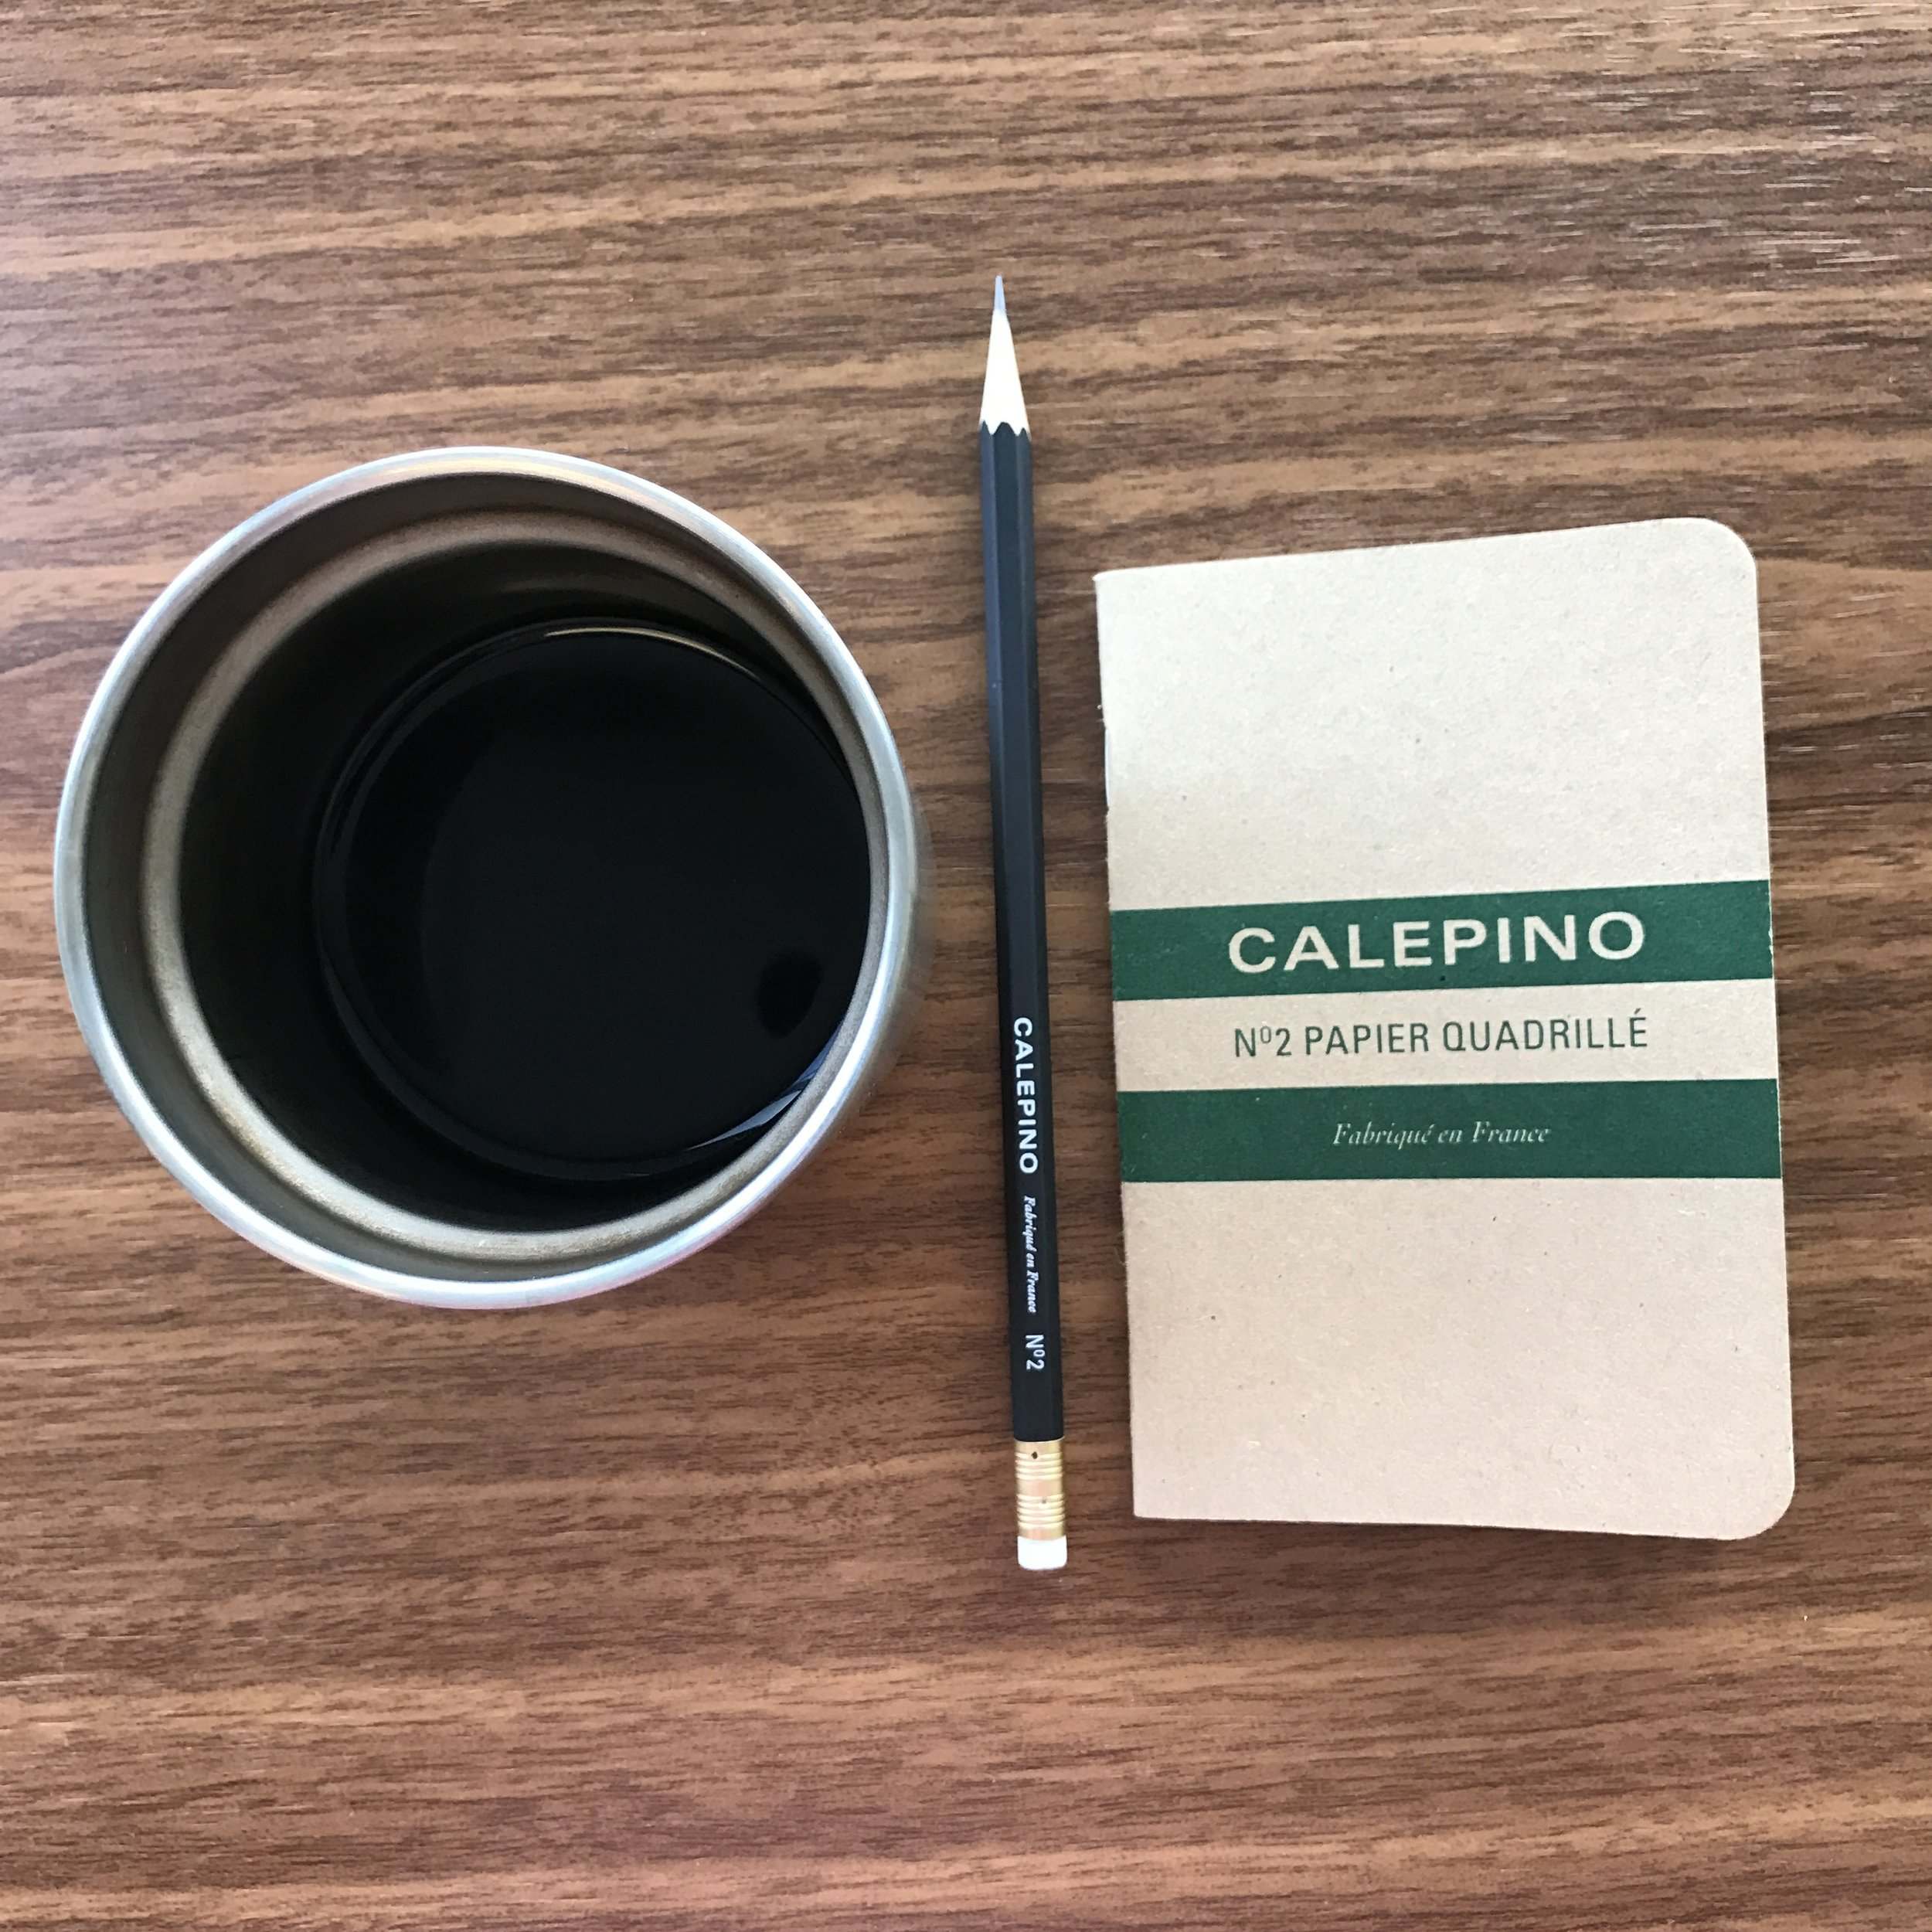 Enjoying my coffee...